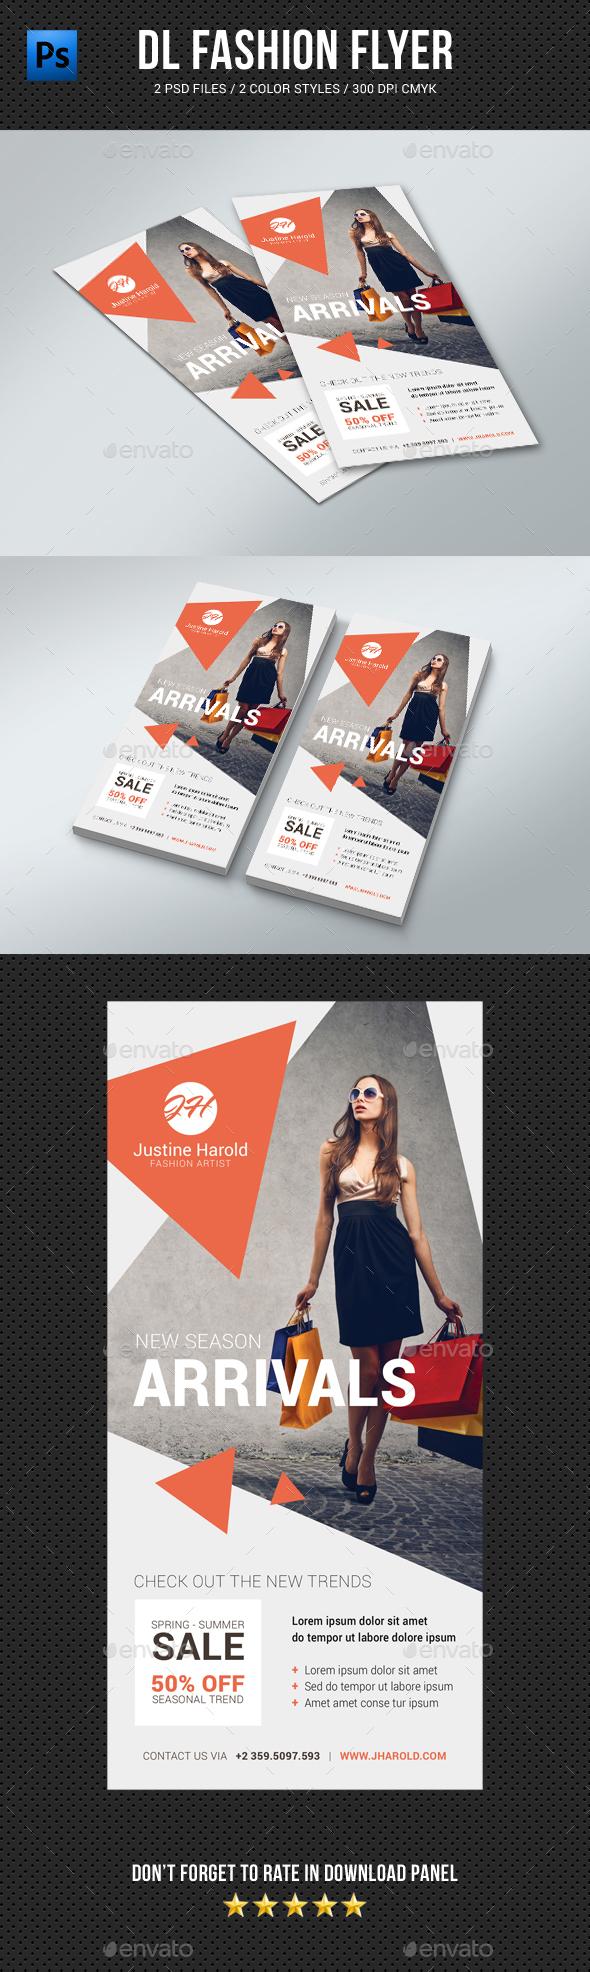 DL Fashion Flyer 03 - Commerce Flyers